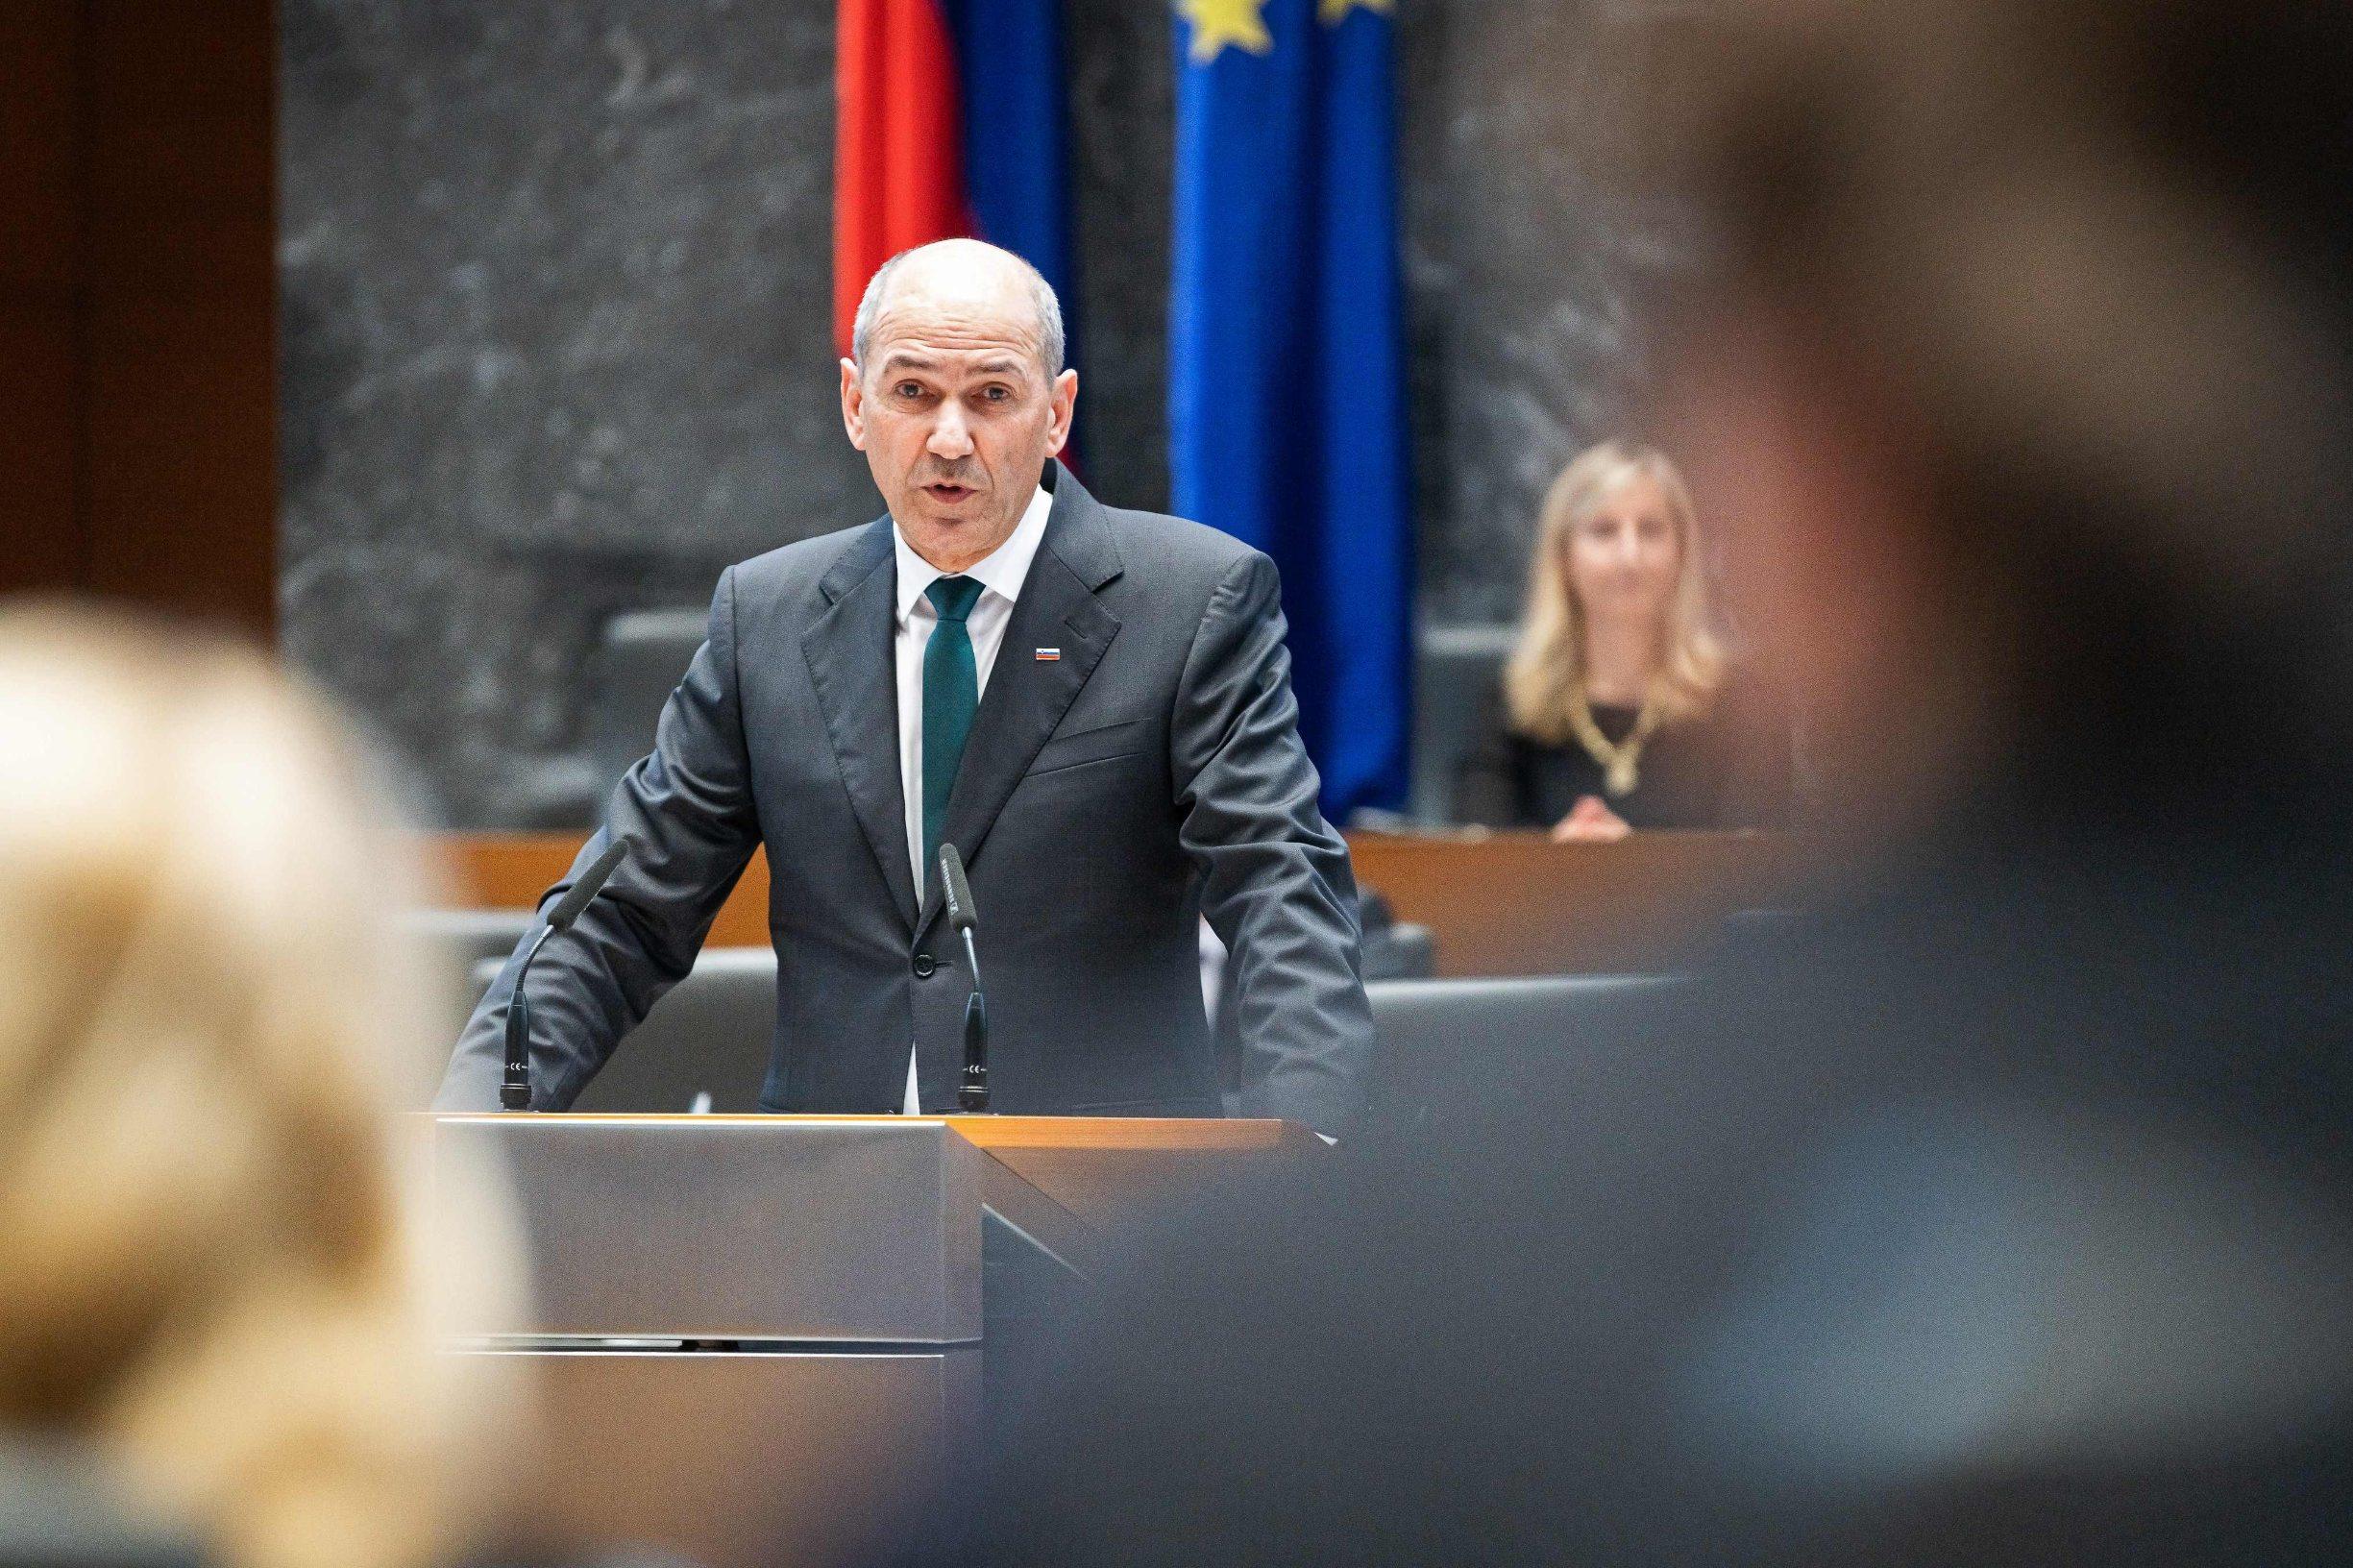 New Slovenian PM Janez Janša